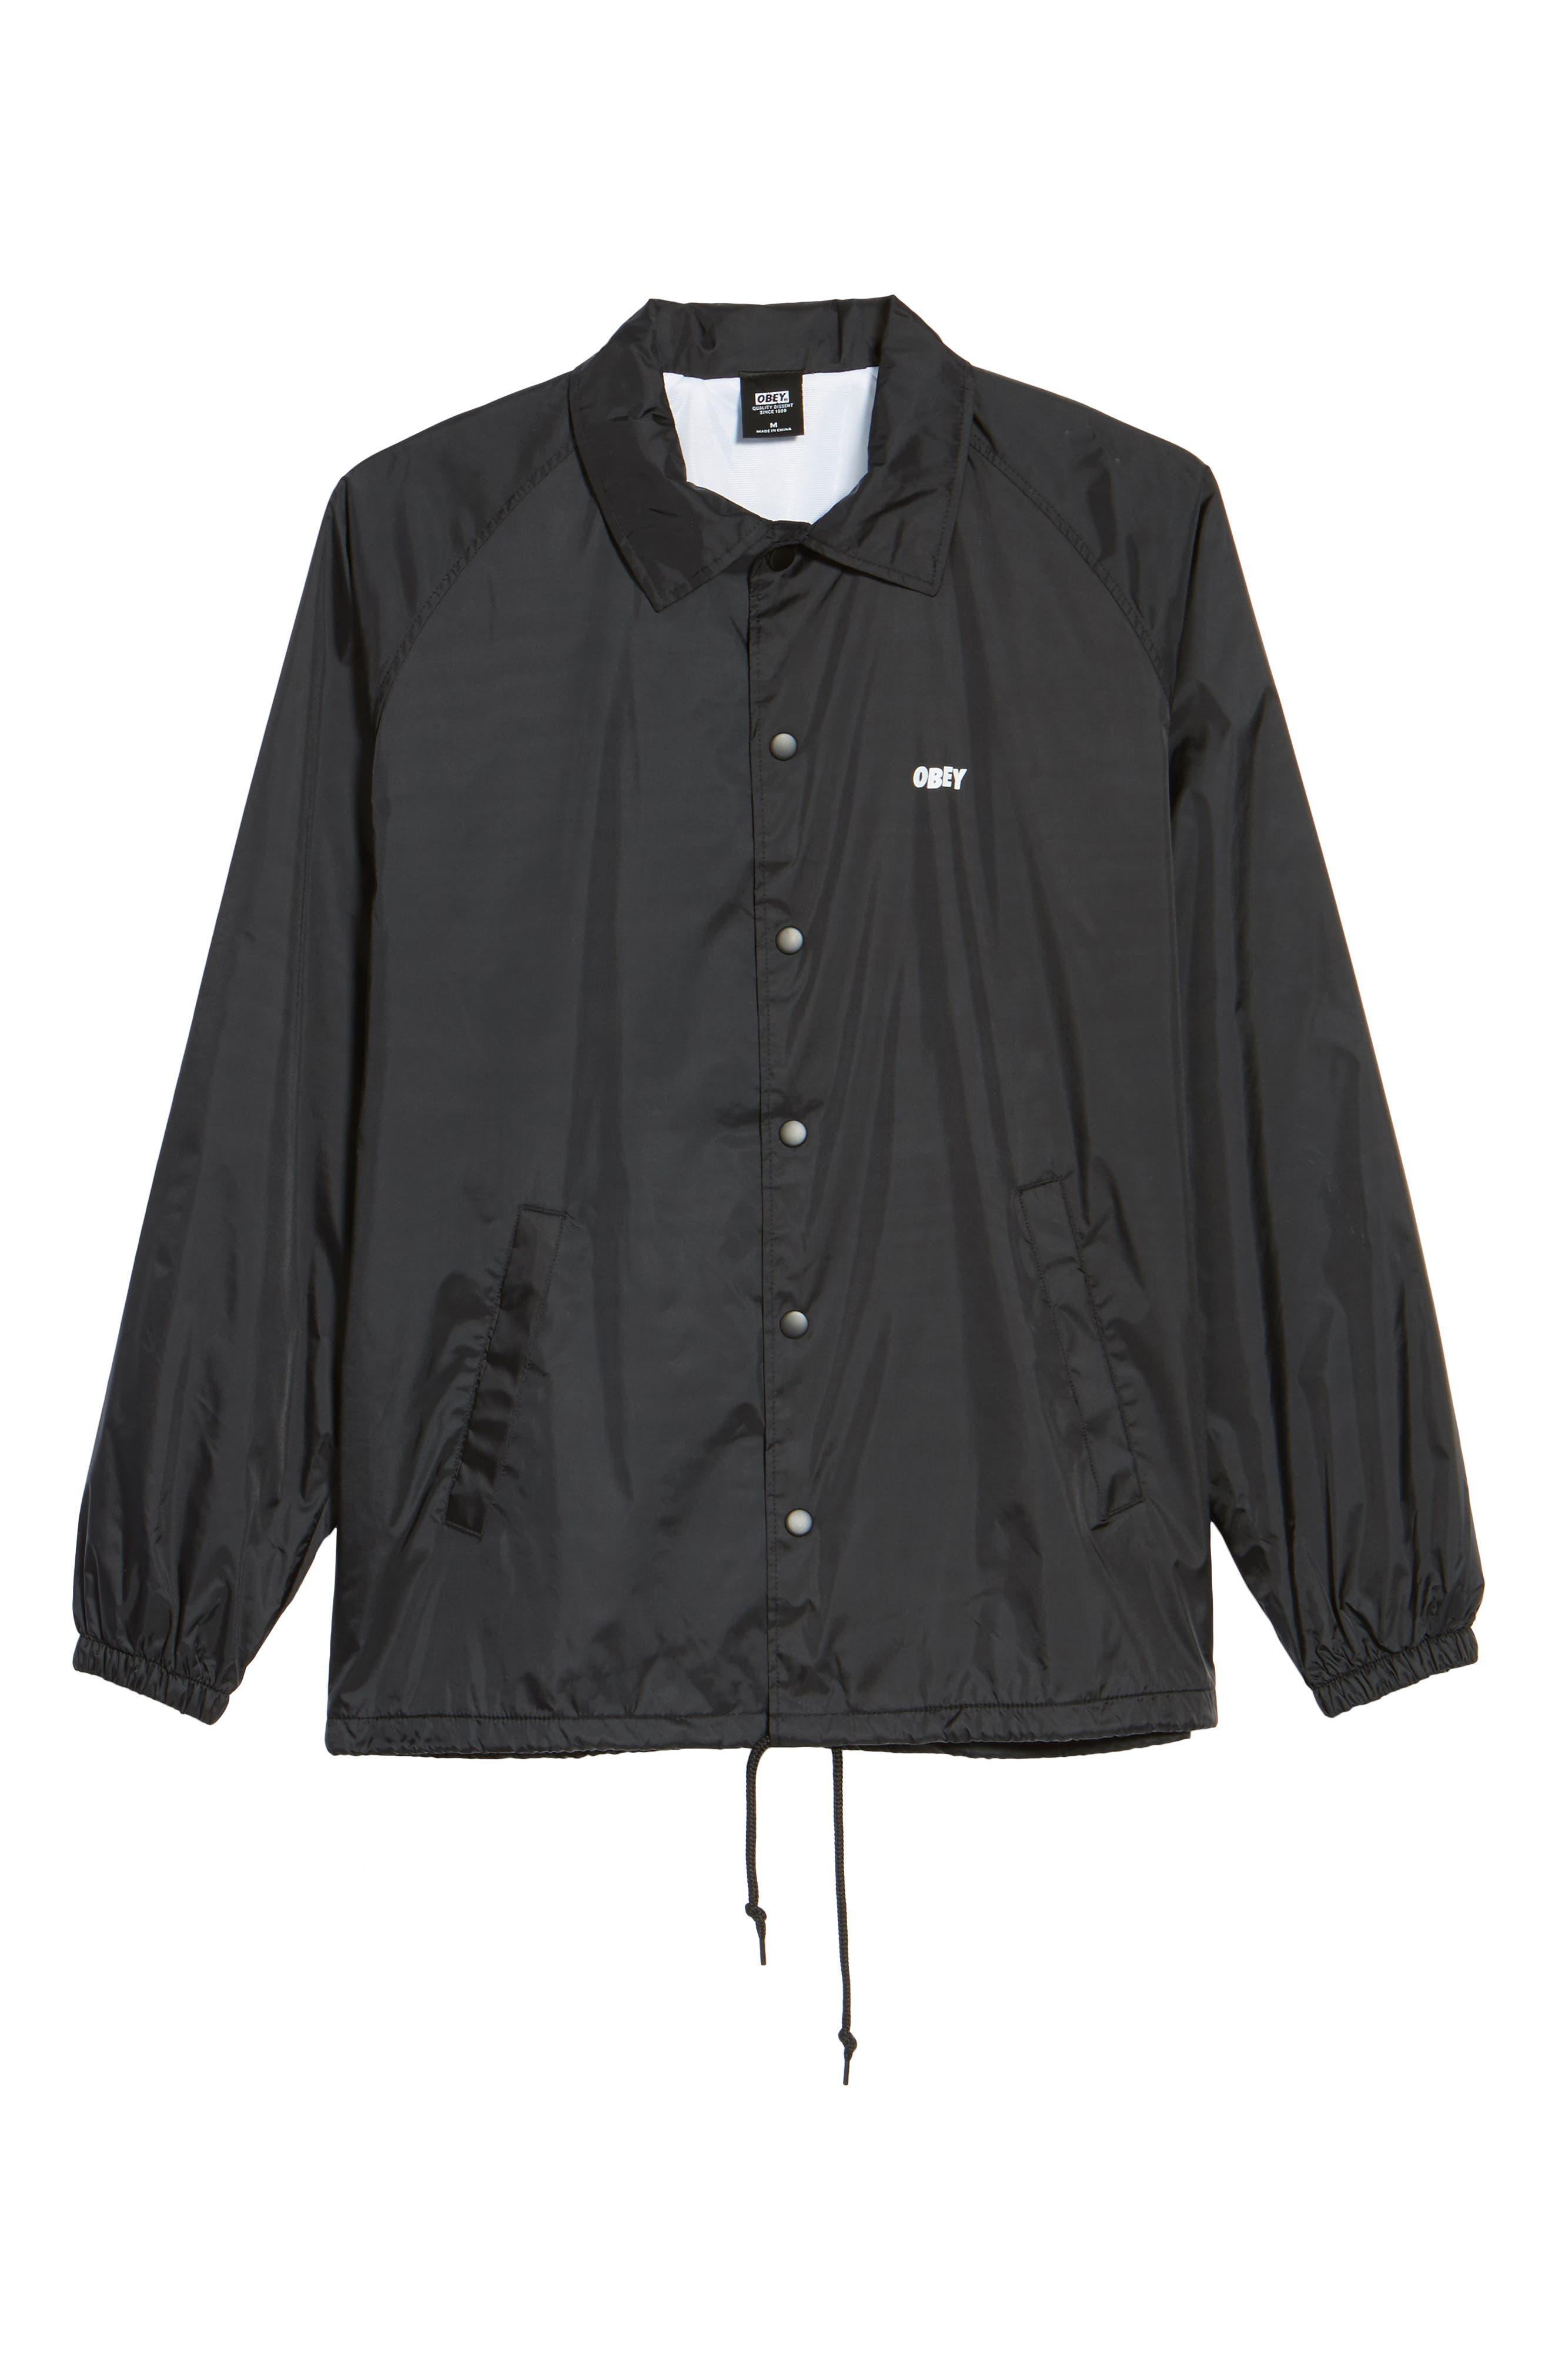 Lo-Fi Graphic Coach's Jacket,                             Alternate thumbnail 5, color,                             001